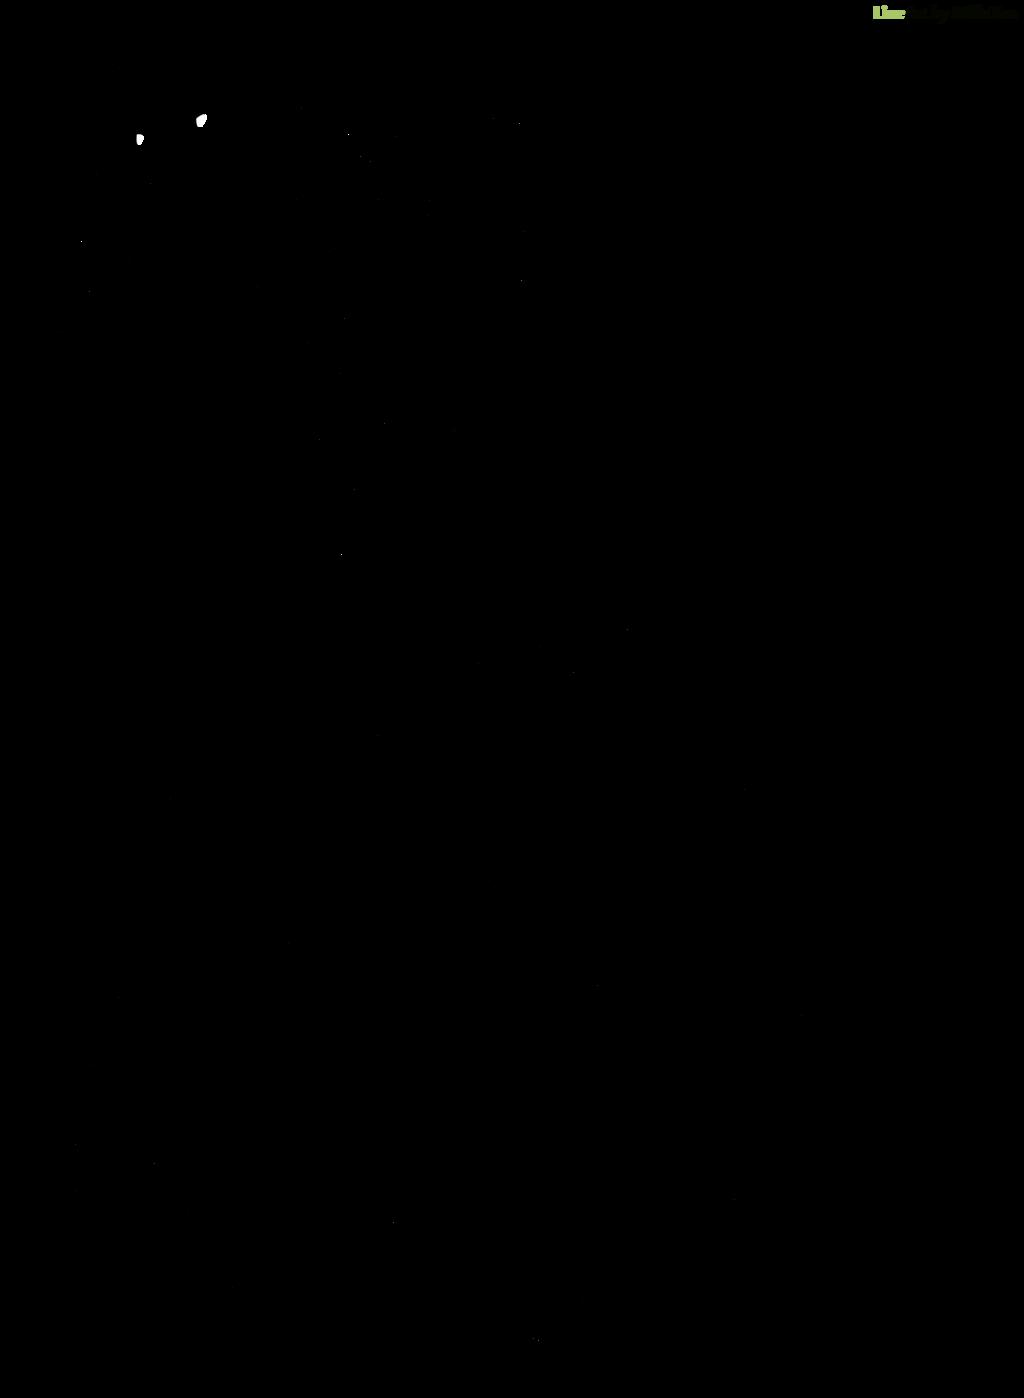 Pin On Color People Adult Women Men [ 1398 x 1024 Pixel ]